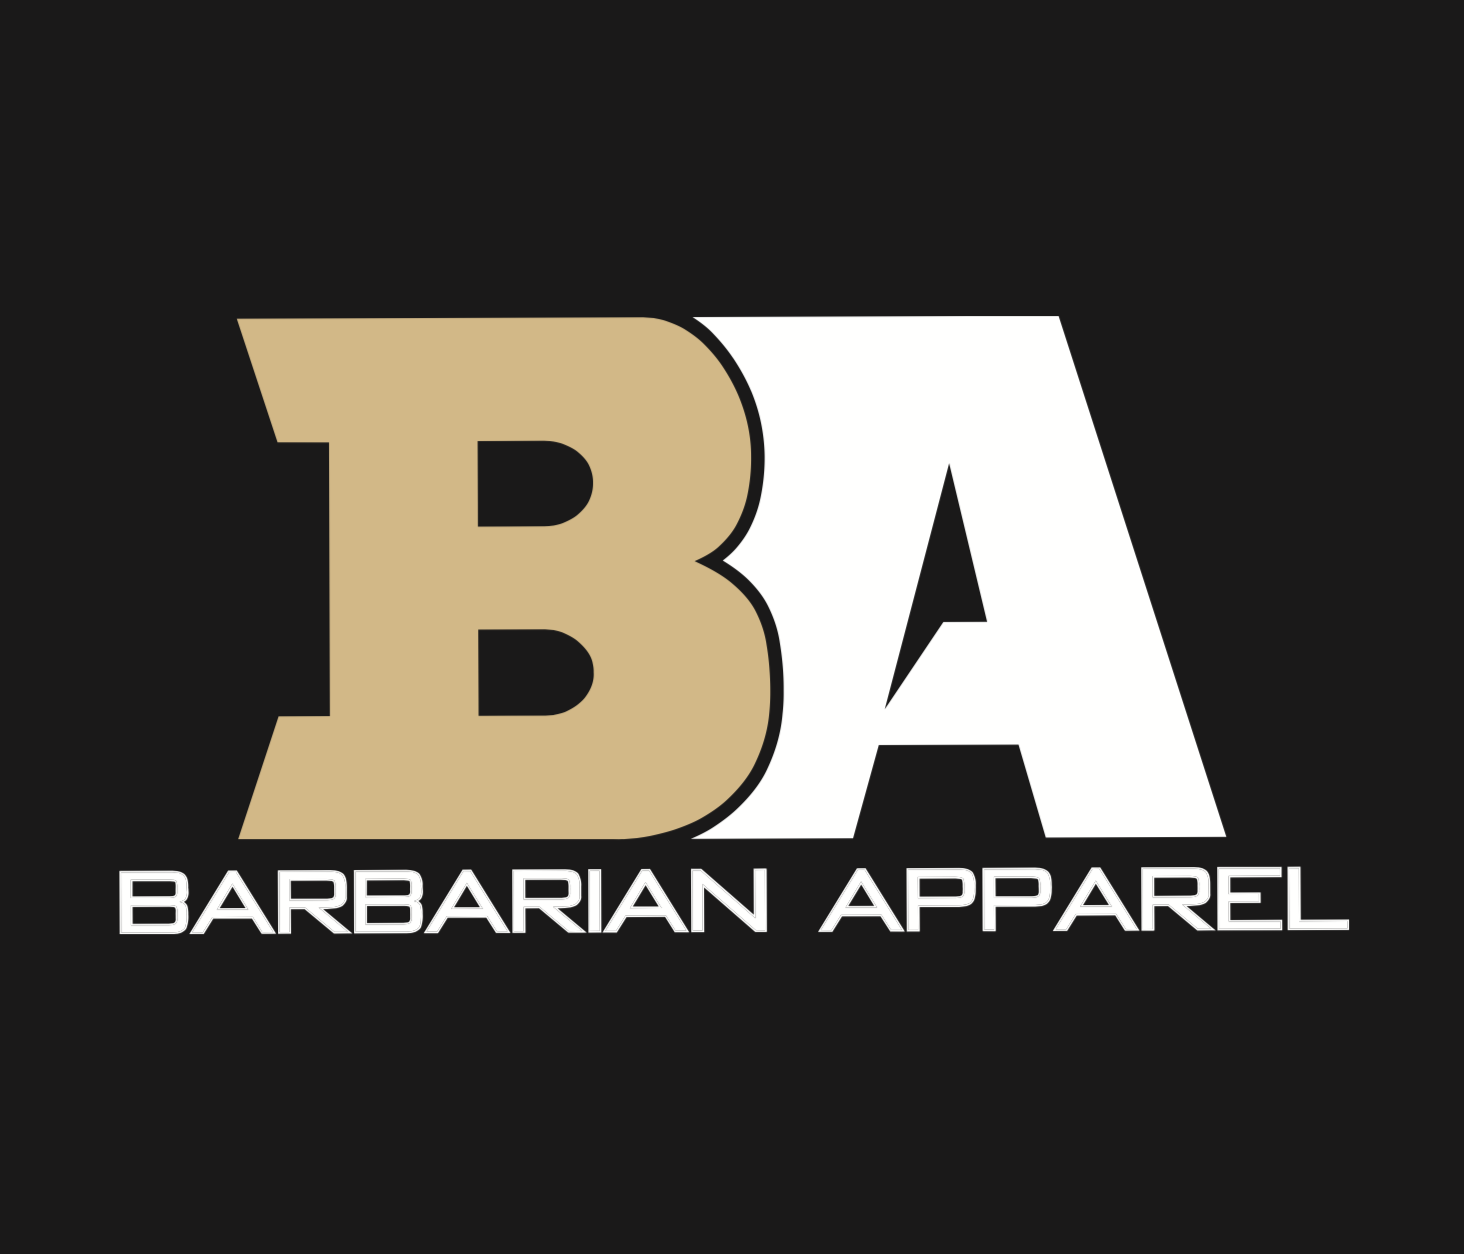 www.barbarianapparel.com